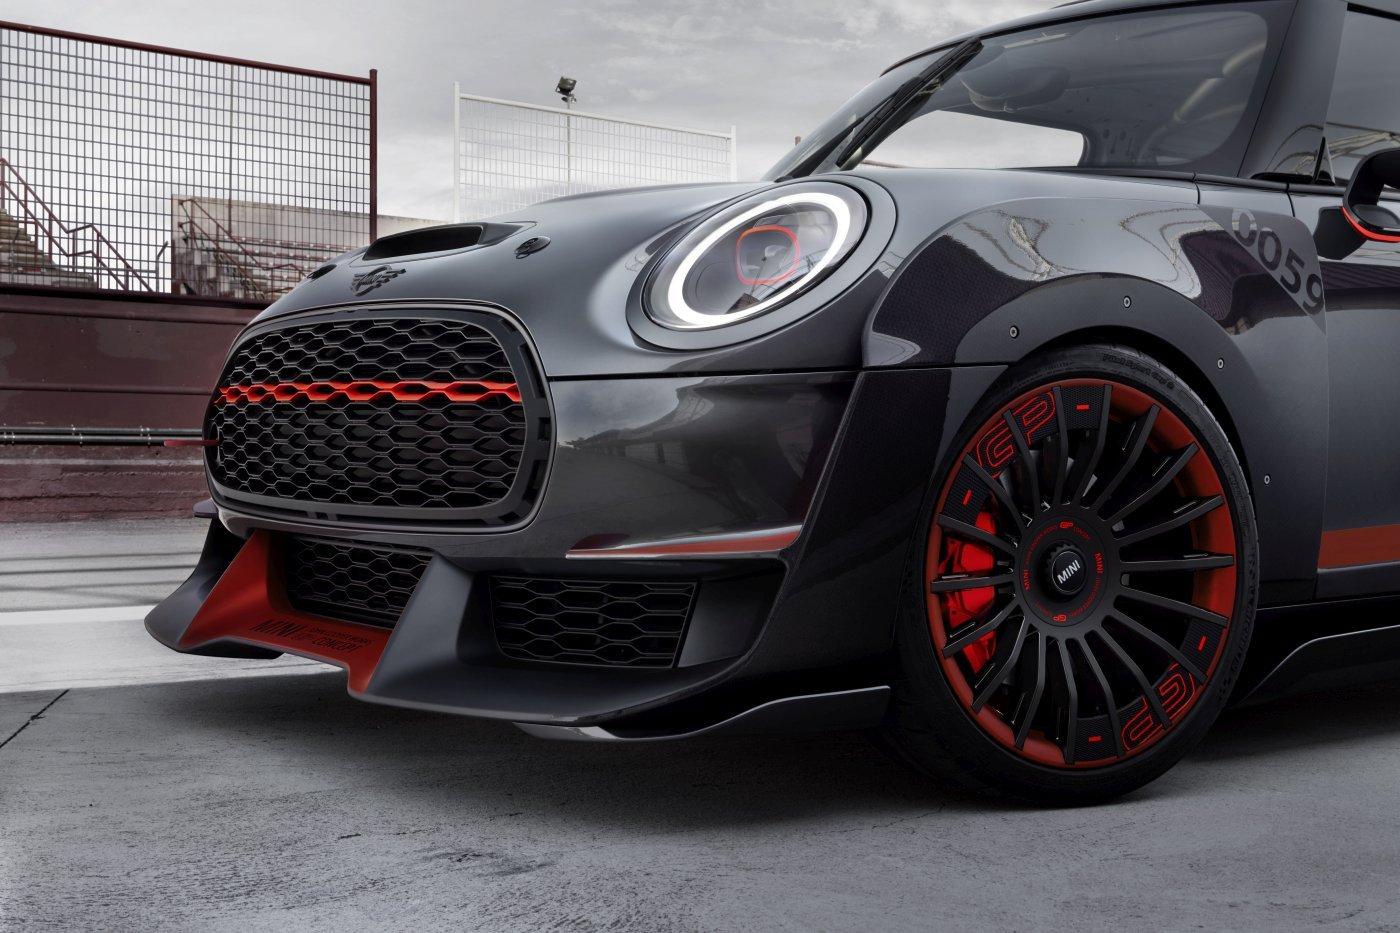 Mini John Cooper Works Gp Mit über 300 Ps Angekündigt Alles Auto